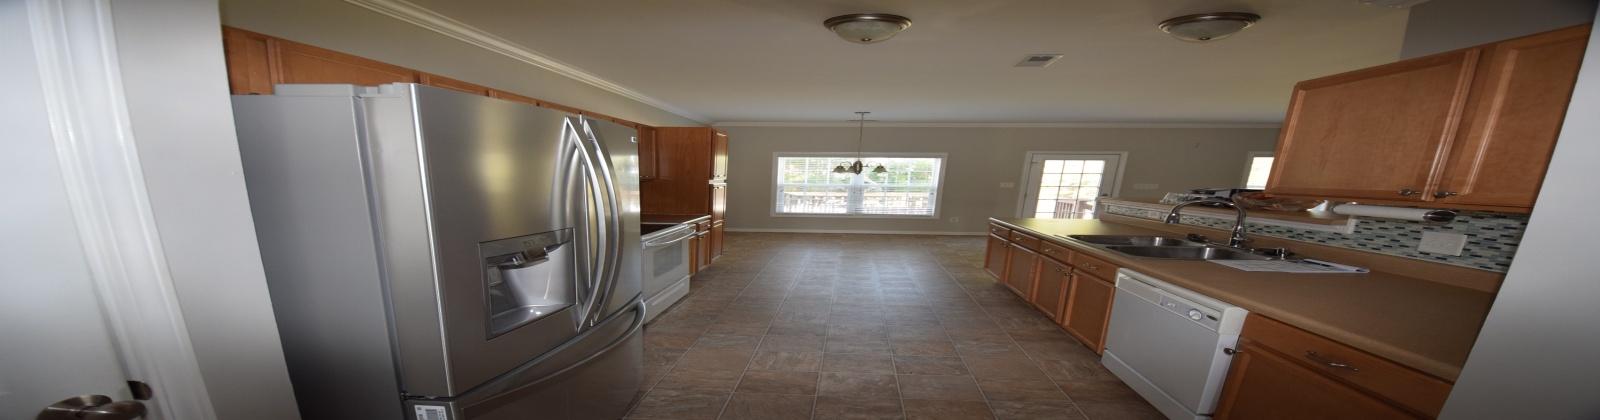 759 Longitude Way Raleigh,North Carolina 27610,4 Bedrooms Bedrooms,2 BathroomsBathrooms,House,Longitude Way,1097